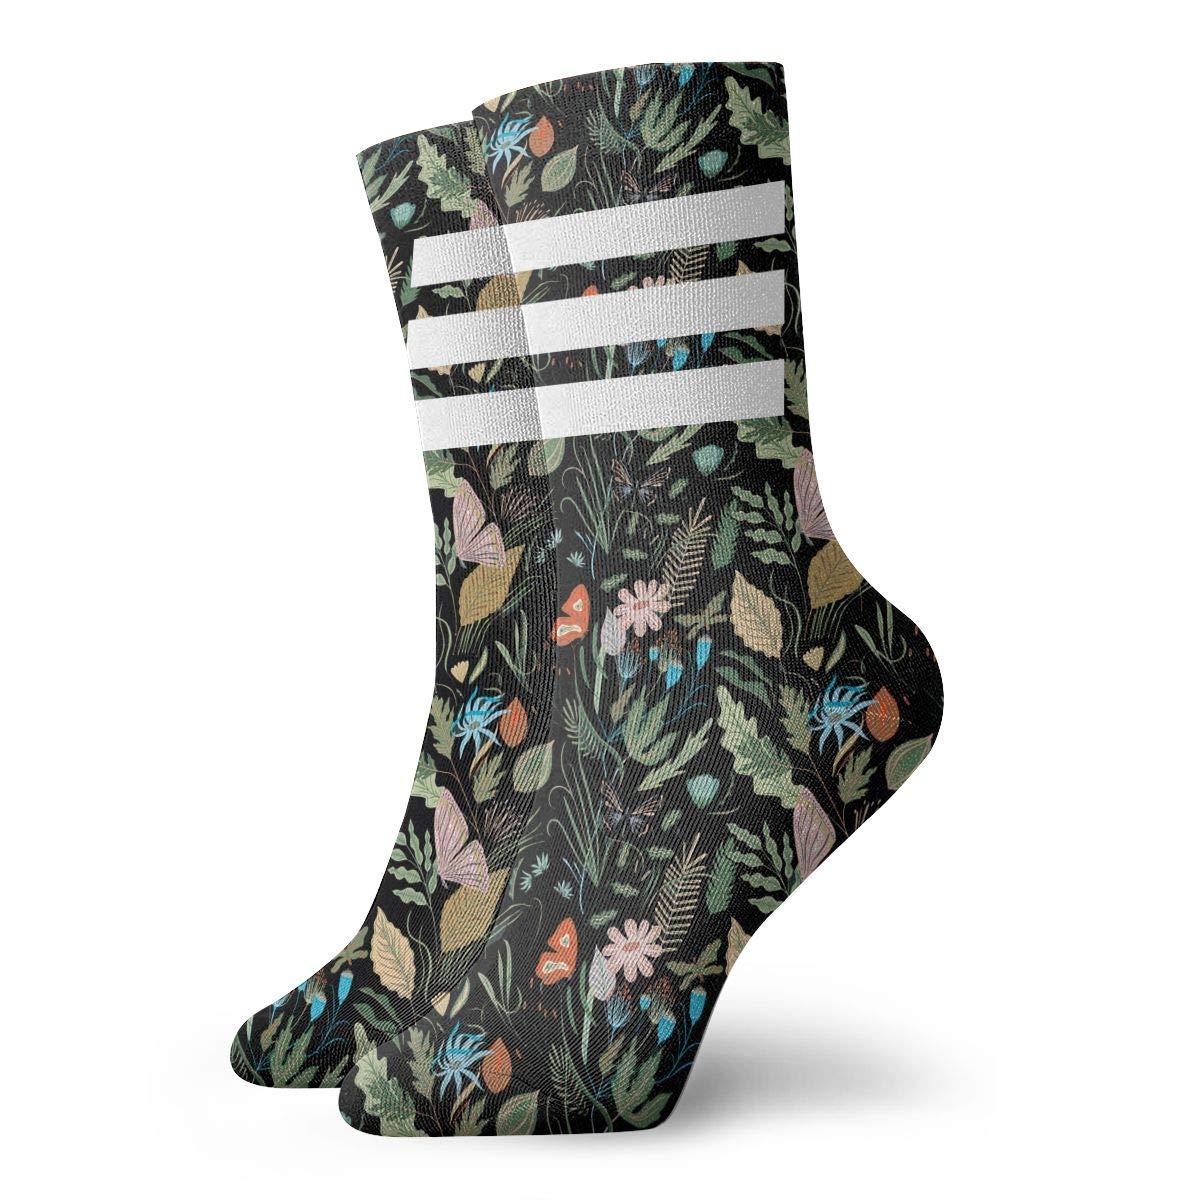 FLOWERS Unisex Funny Casual Crew Socks Athletic Socks For Boys Girls Kids Teenagers